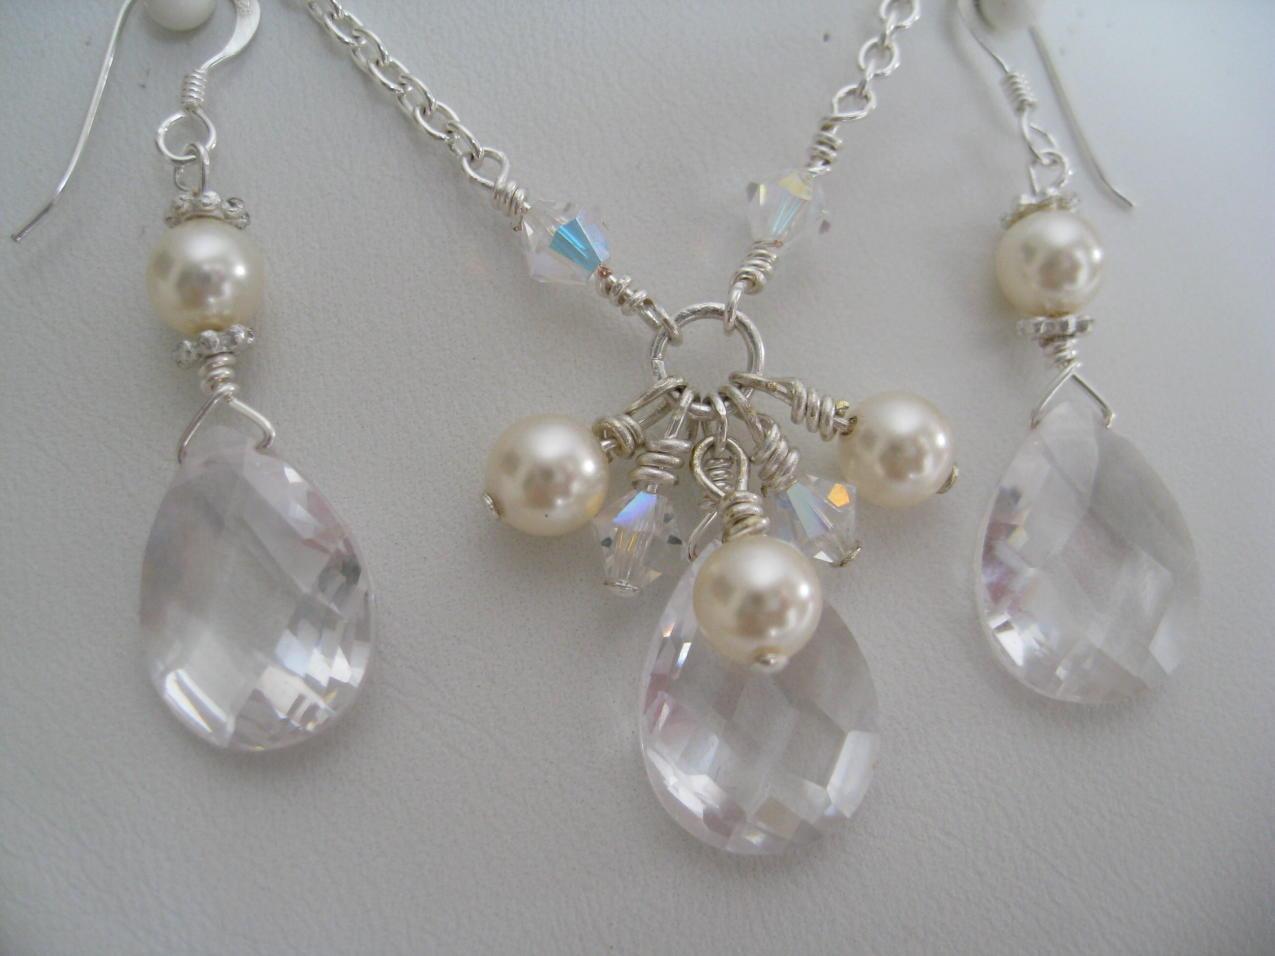 Bridesmaids, Bridesmaids Dresses, Fashion, Pearls, Swarovski, Maisie, Cubic, Zirconia